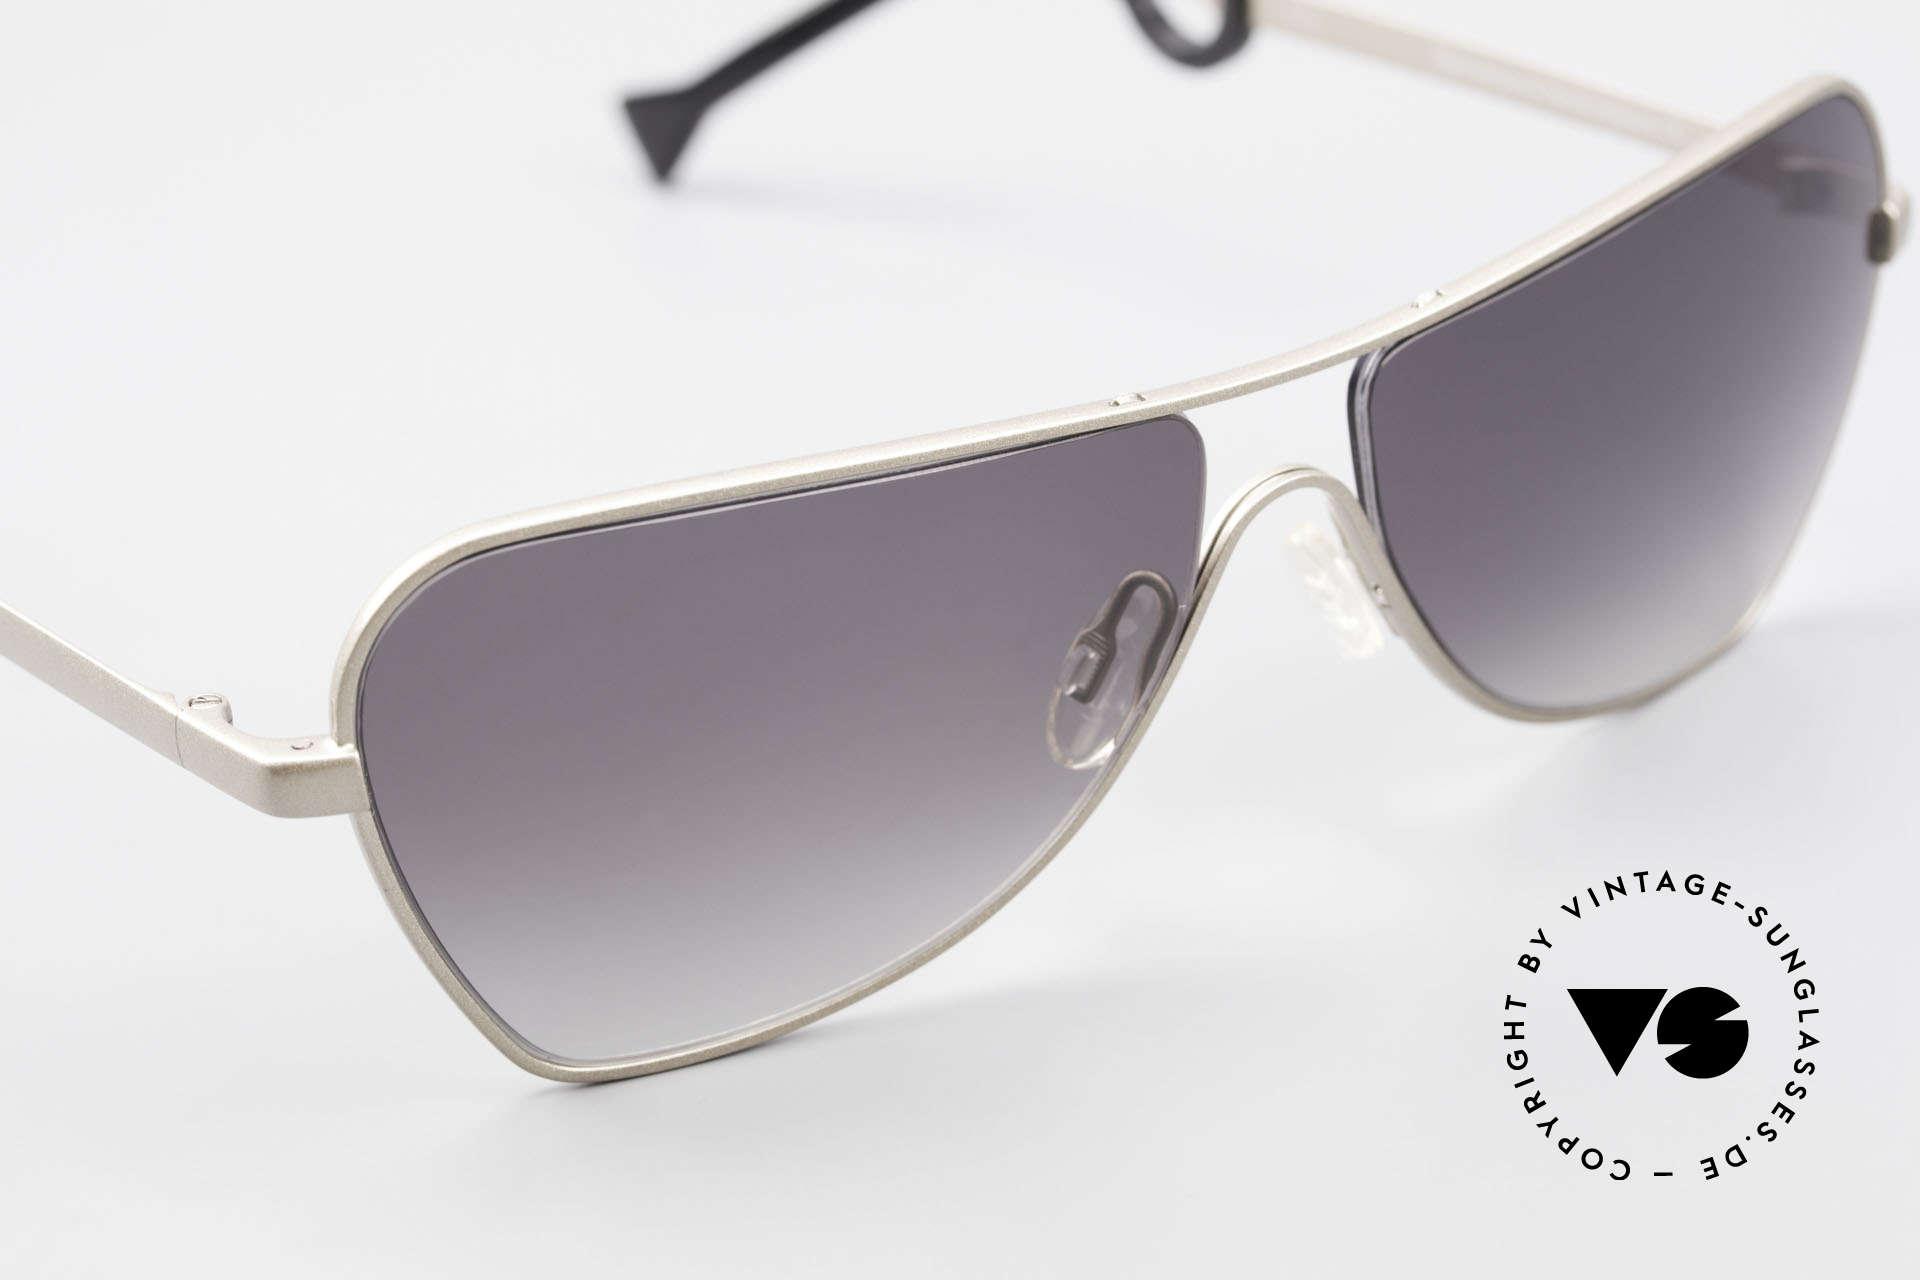 Theo Belgium Stetson Extraordinary Aviator Shades, so to speak: vintage sunglasses with representativeness, Made for Men and Women